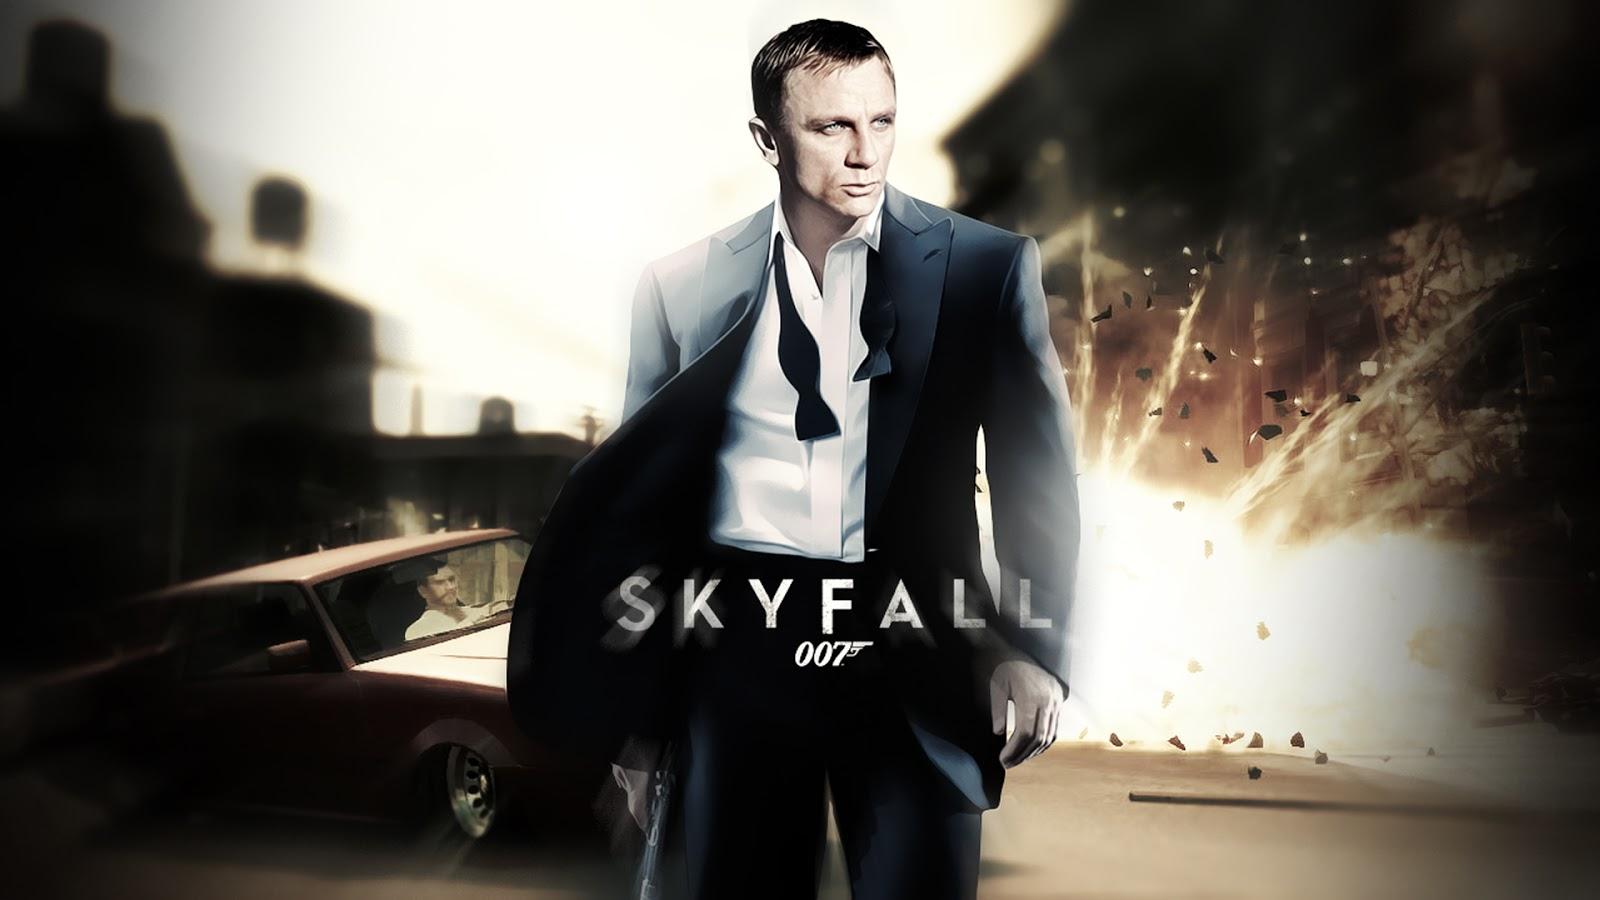 James Bond Skyfall  Download